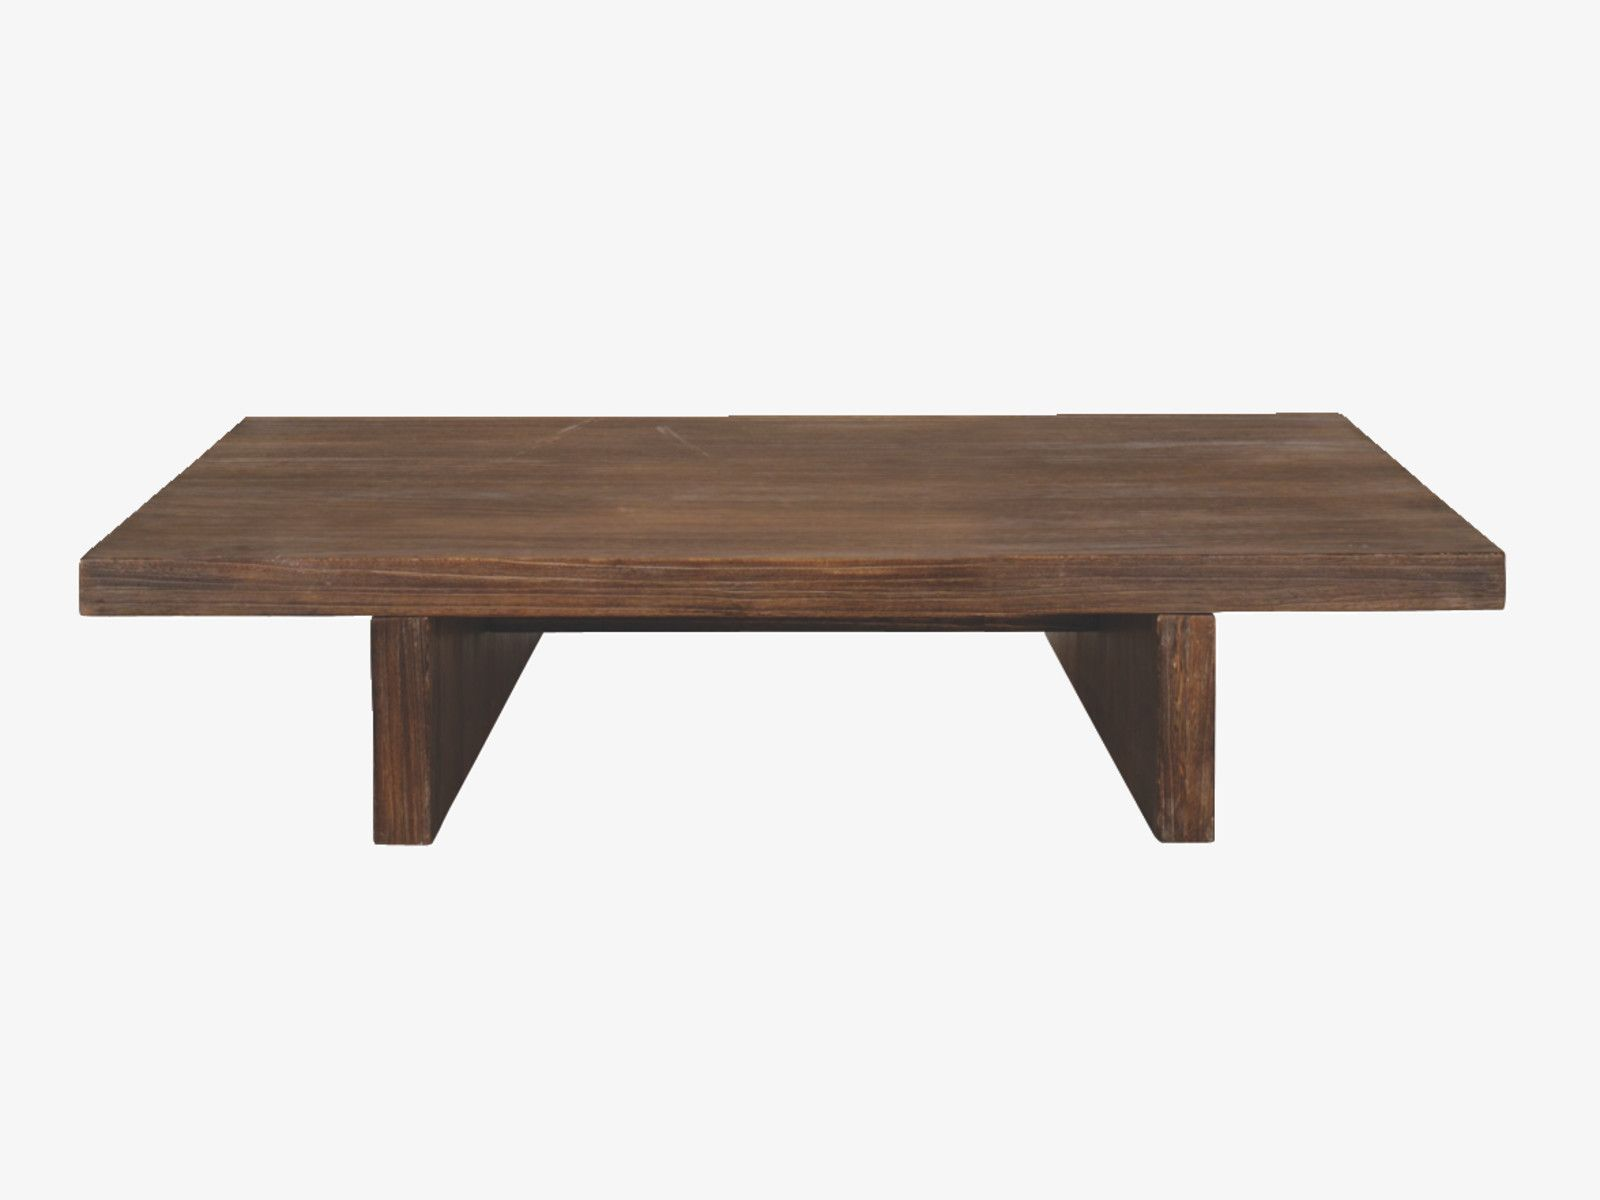 Bakota Braun Holz Couchtisch Couchtische Habitat Coffee Table Low Tables Coffee Table Habitat [ 1200 x 1600 Pixel ]